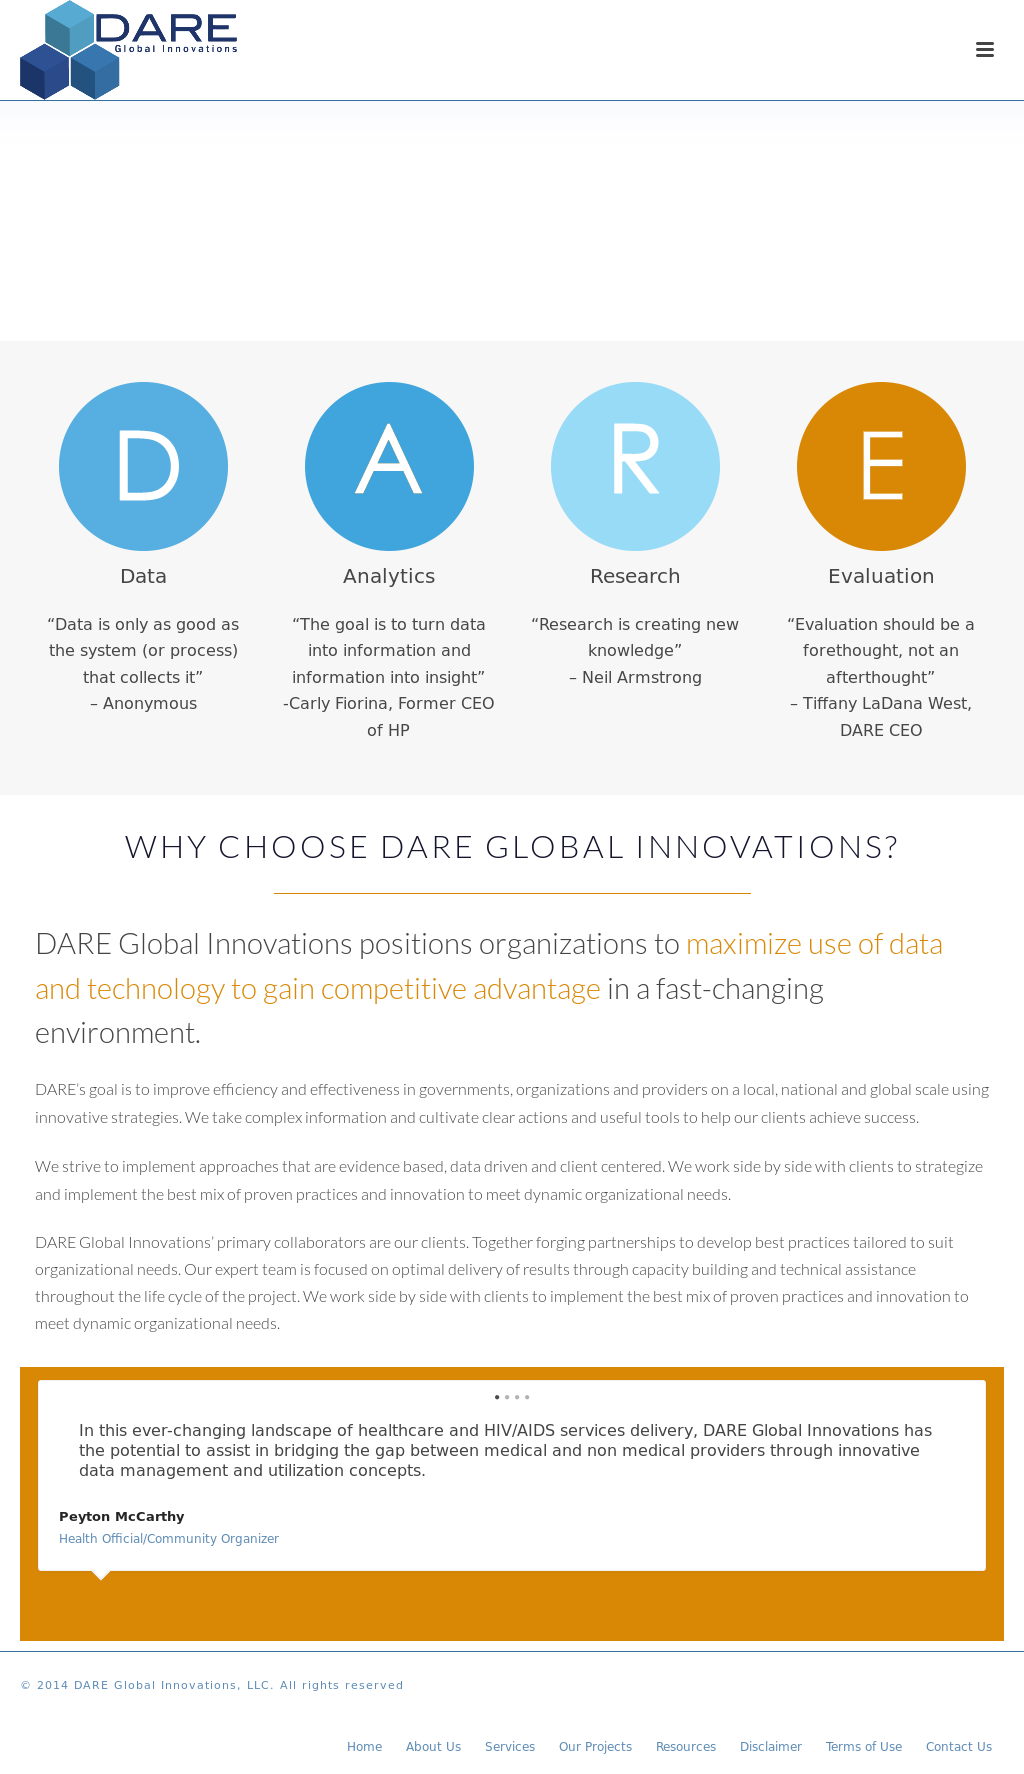 dare effectiveness